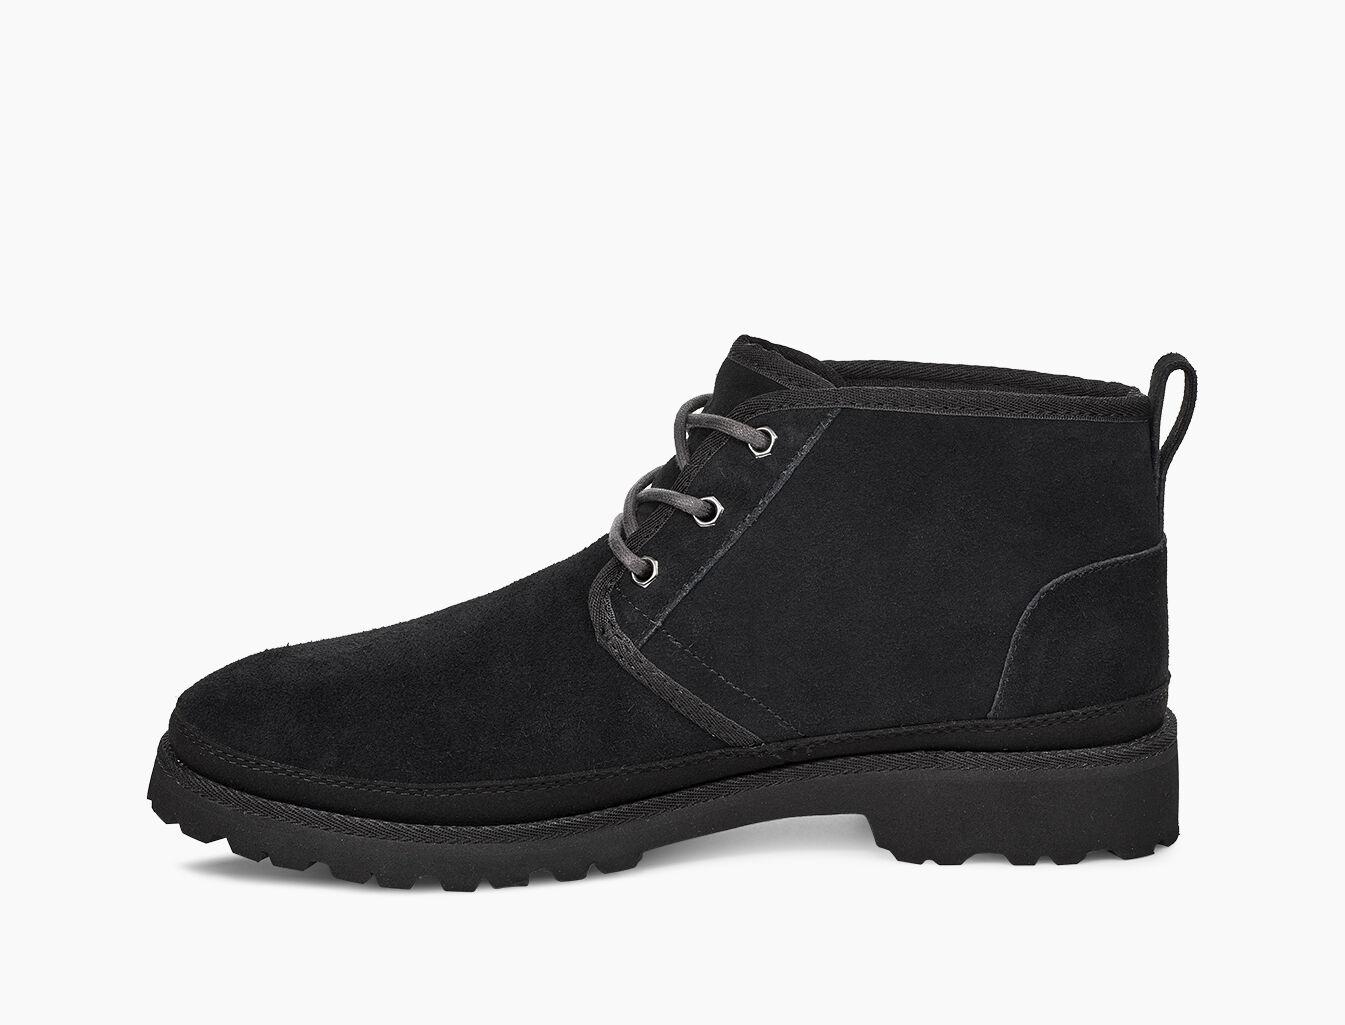 Men's Neuland Boot | UGG Official®